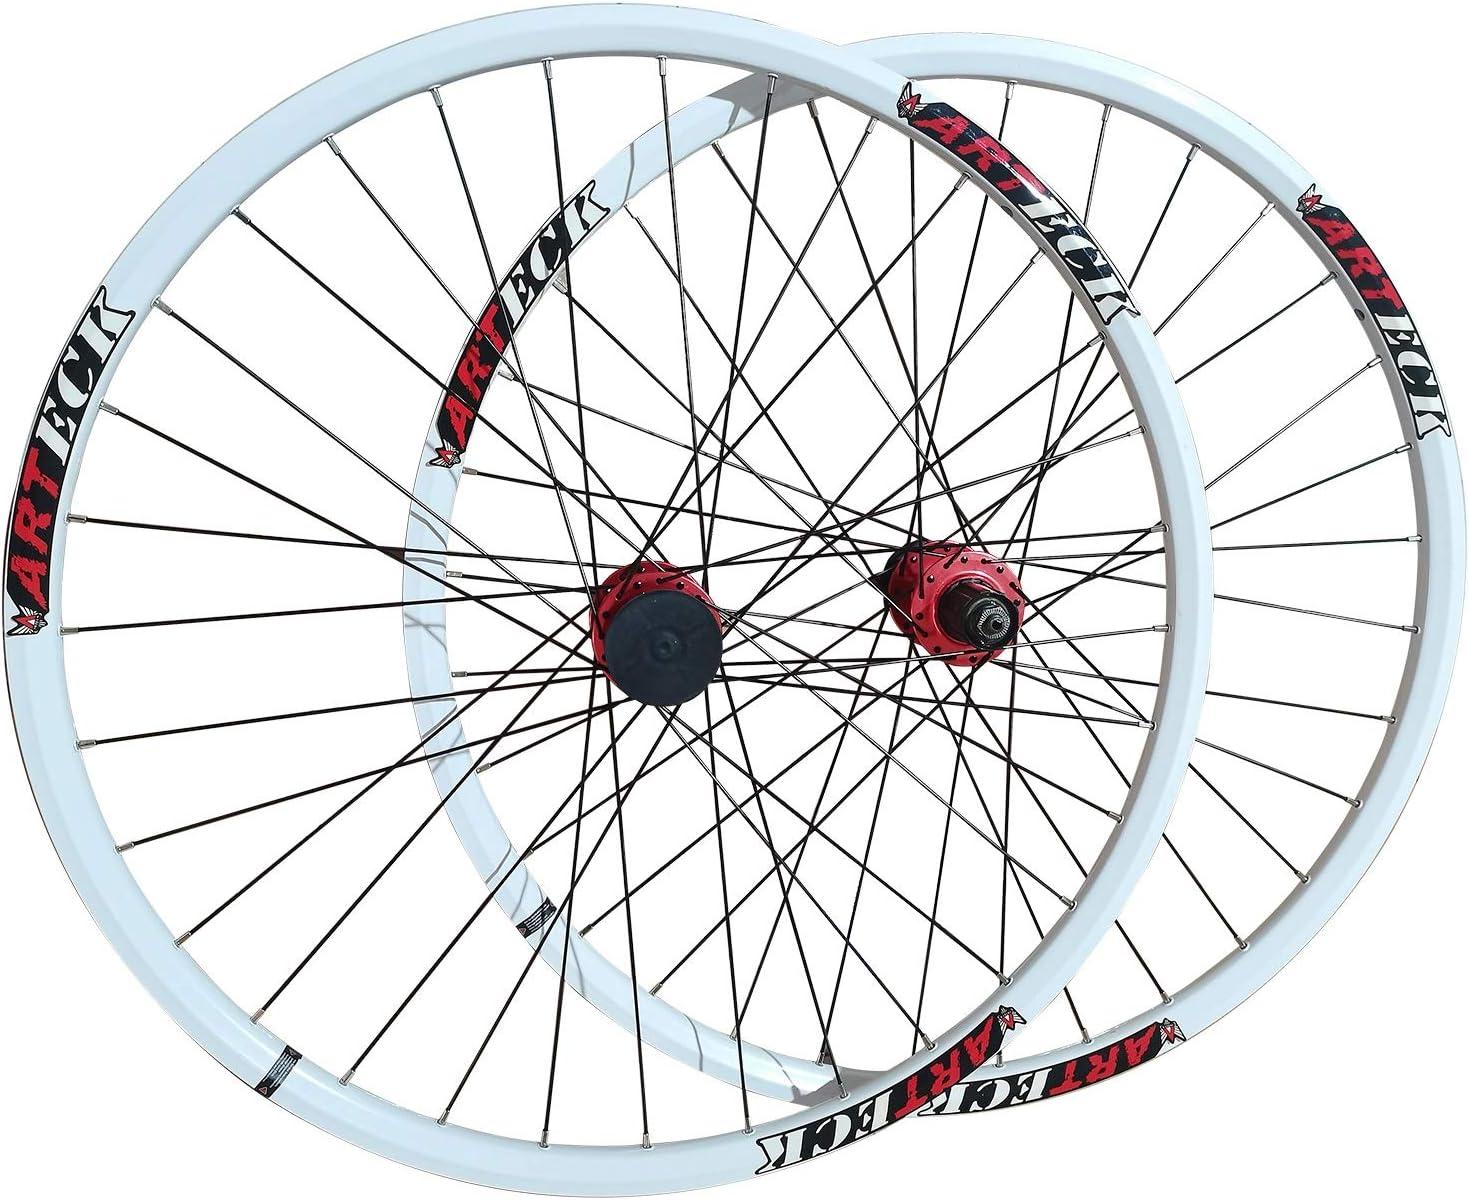 MZPWJD MTB In a popularity sale Bike Wheelset 26 Inch Bicycle Doubl Wheels Disc Brake